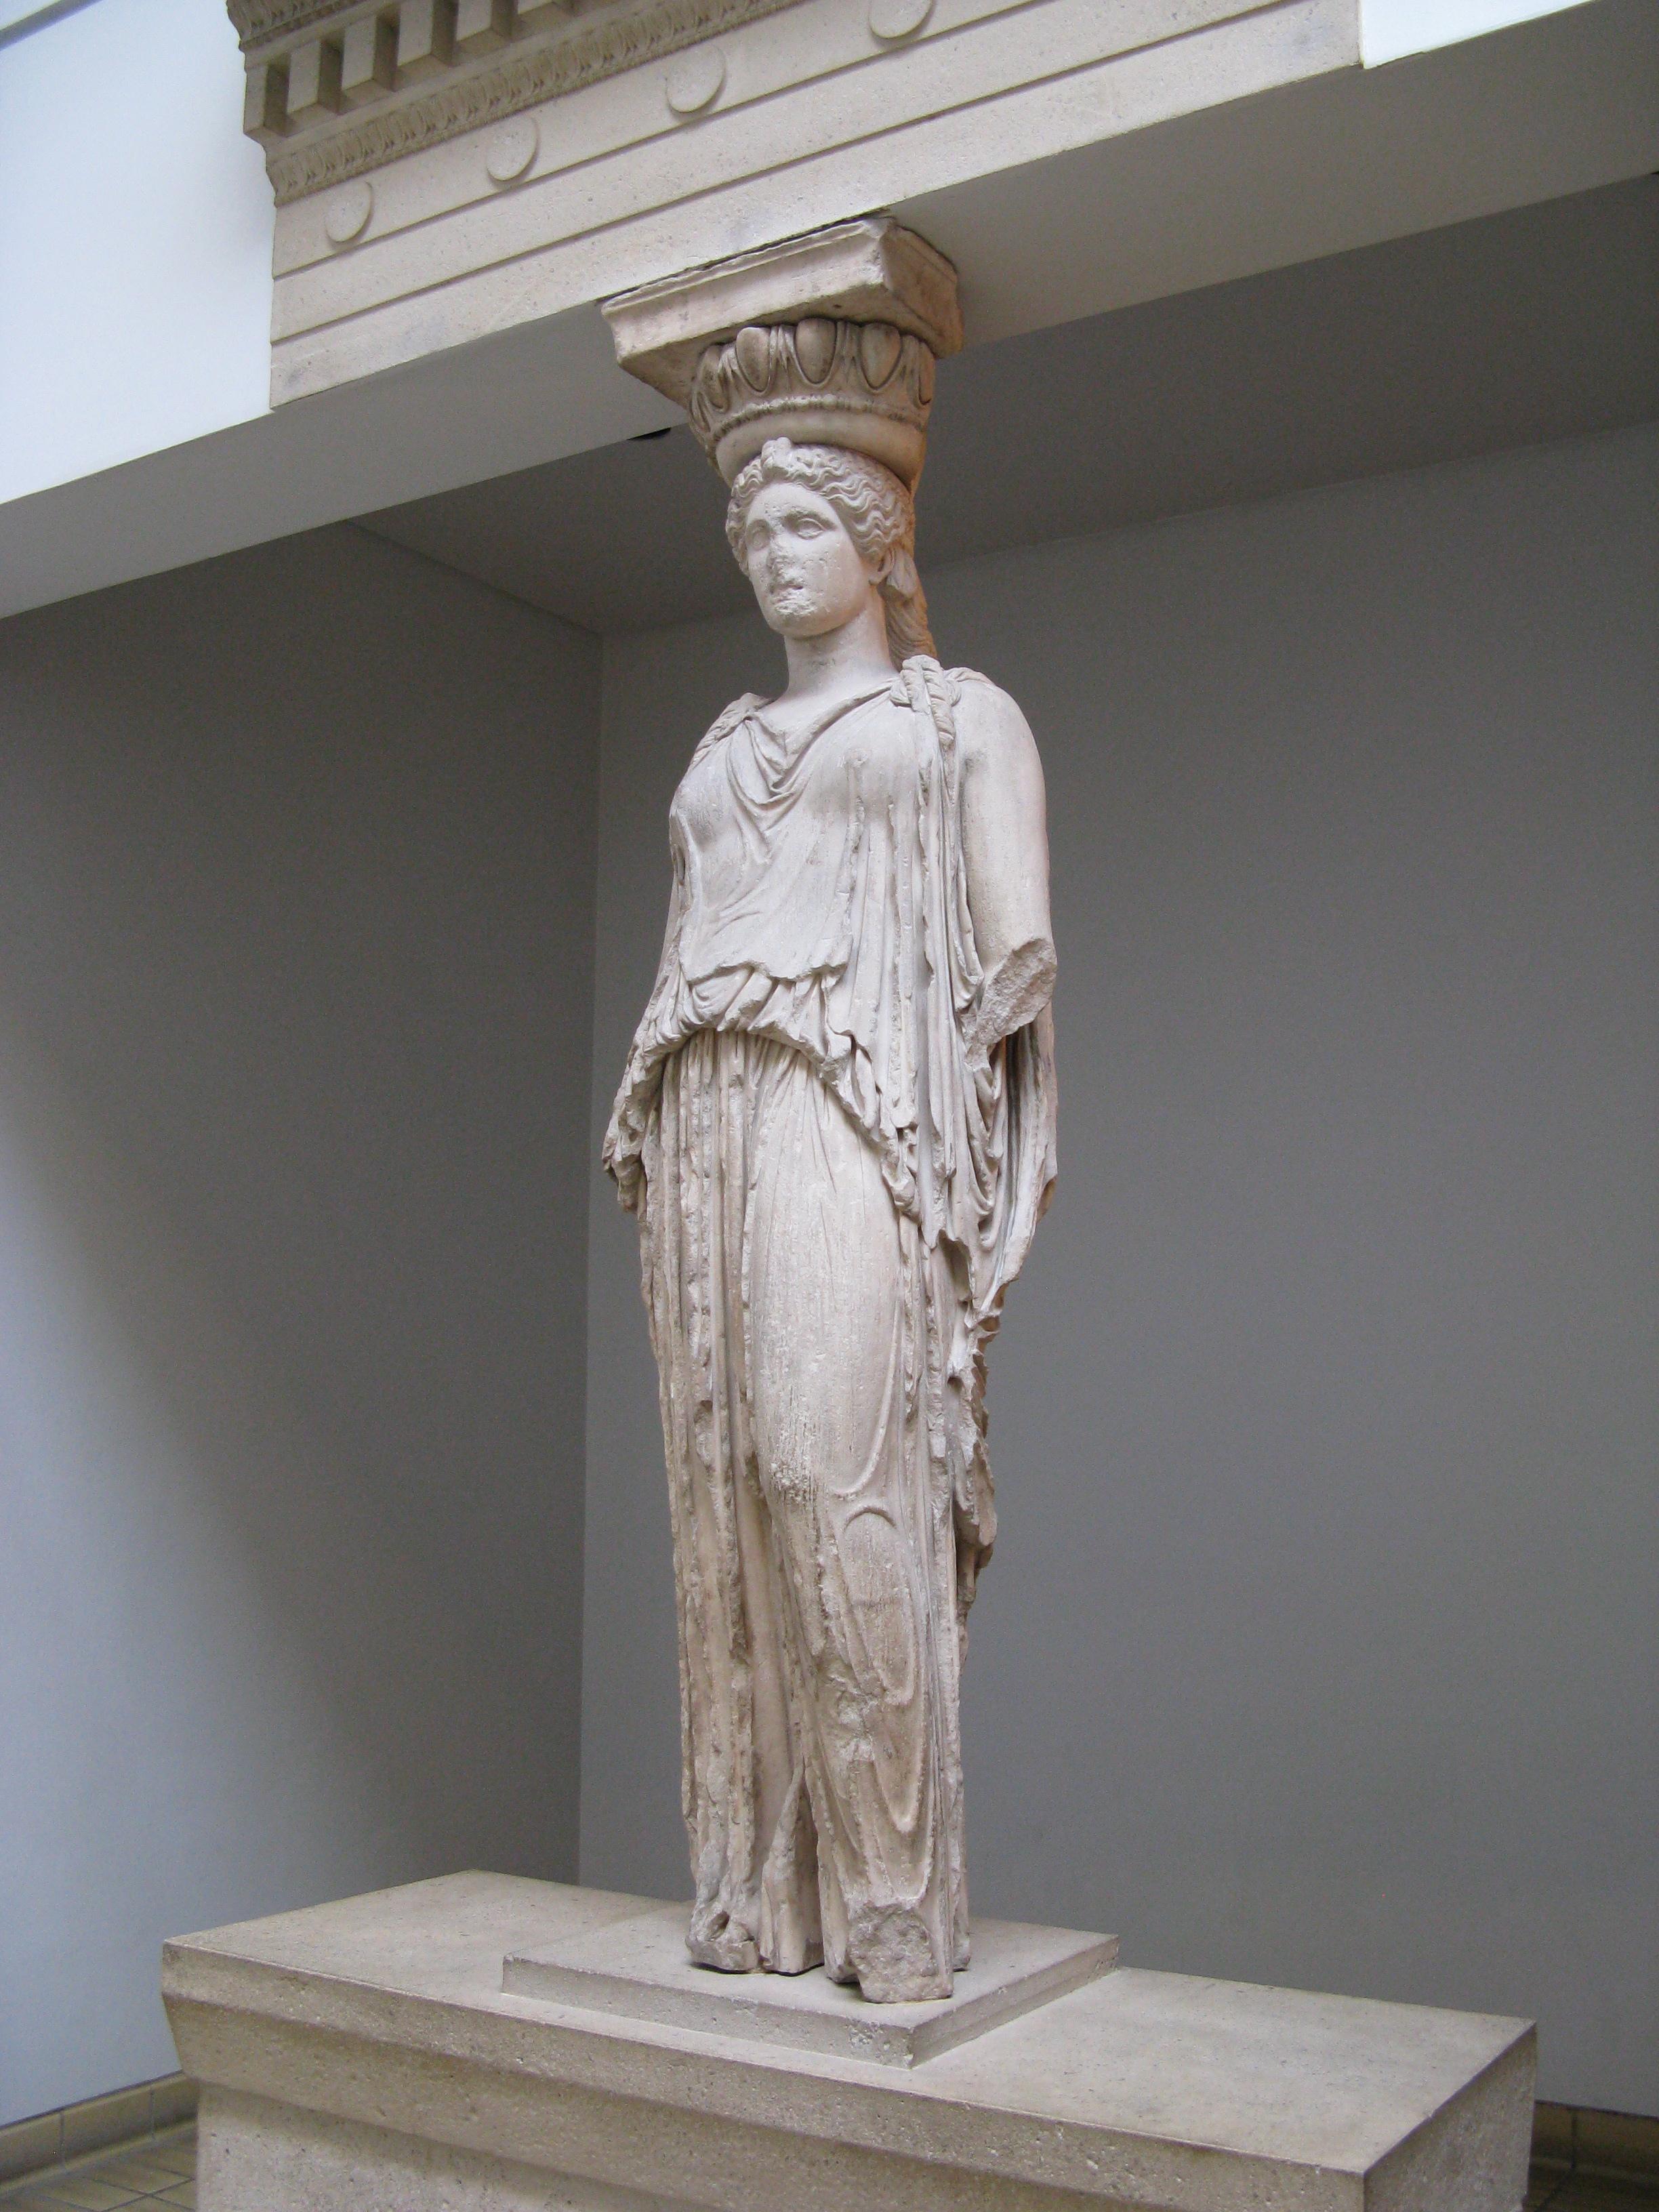 File:Caryatid-Erechtheum-British Museum.jpg - Wikimedia ...